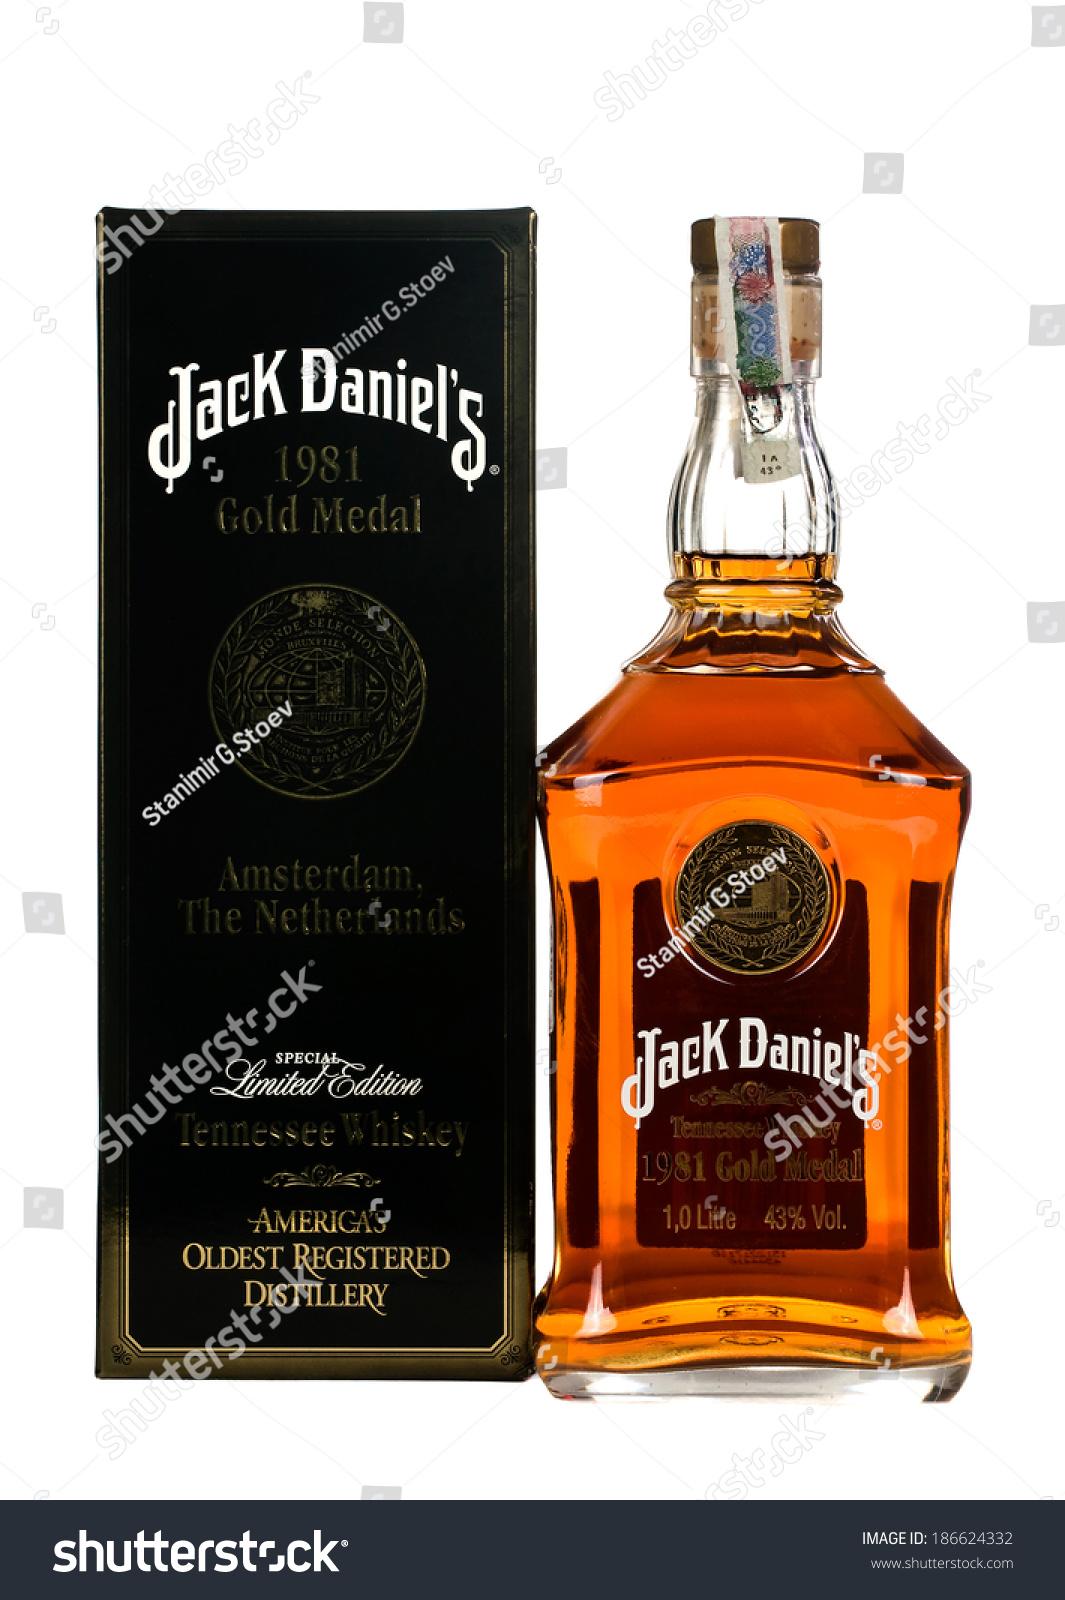 varnabulgariamarch 022014 photo botle jack daniels stock photo edit